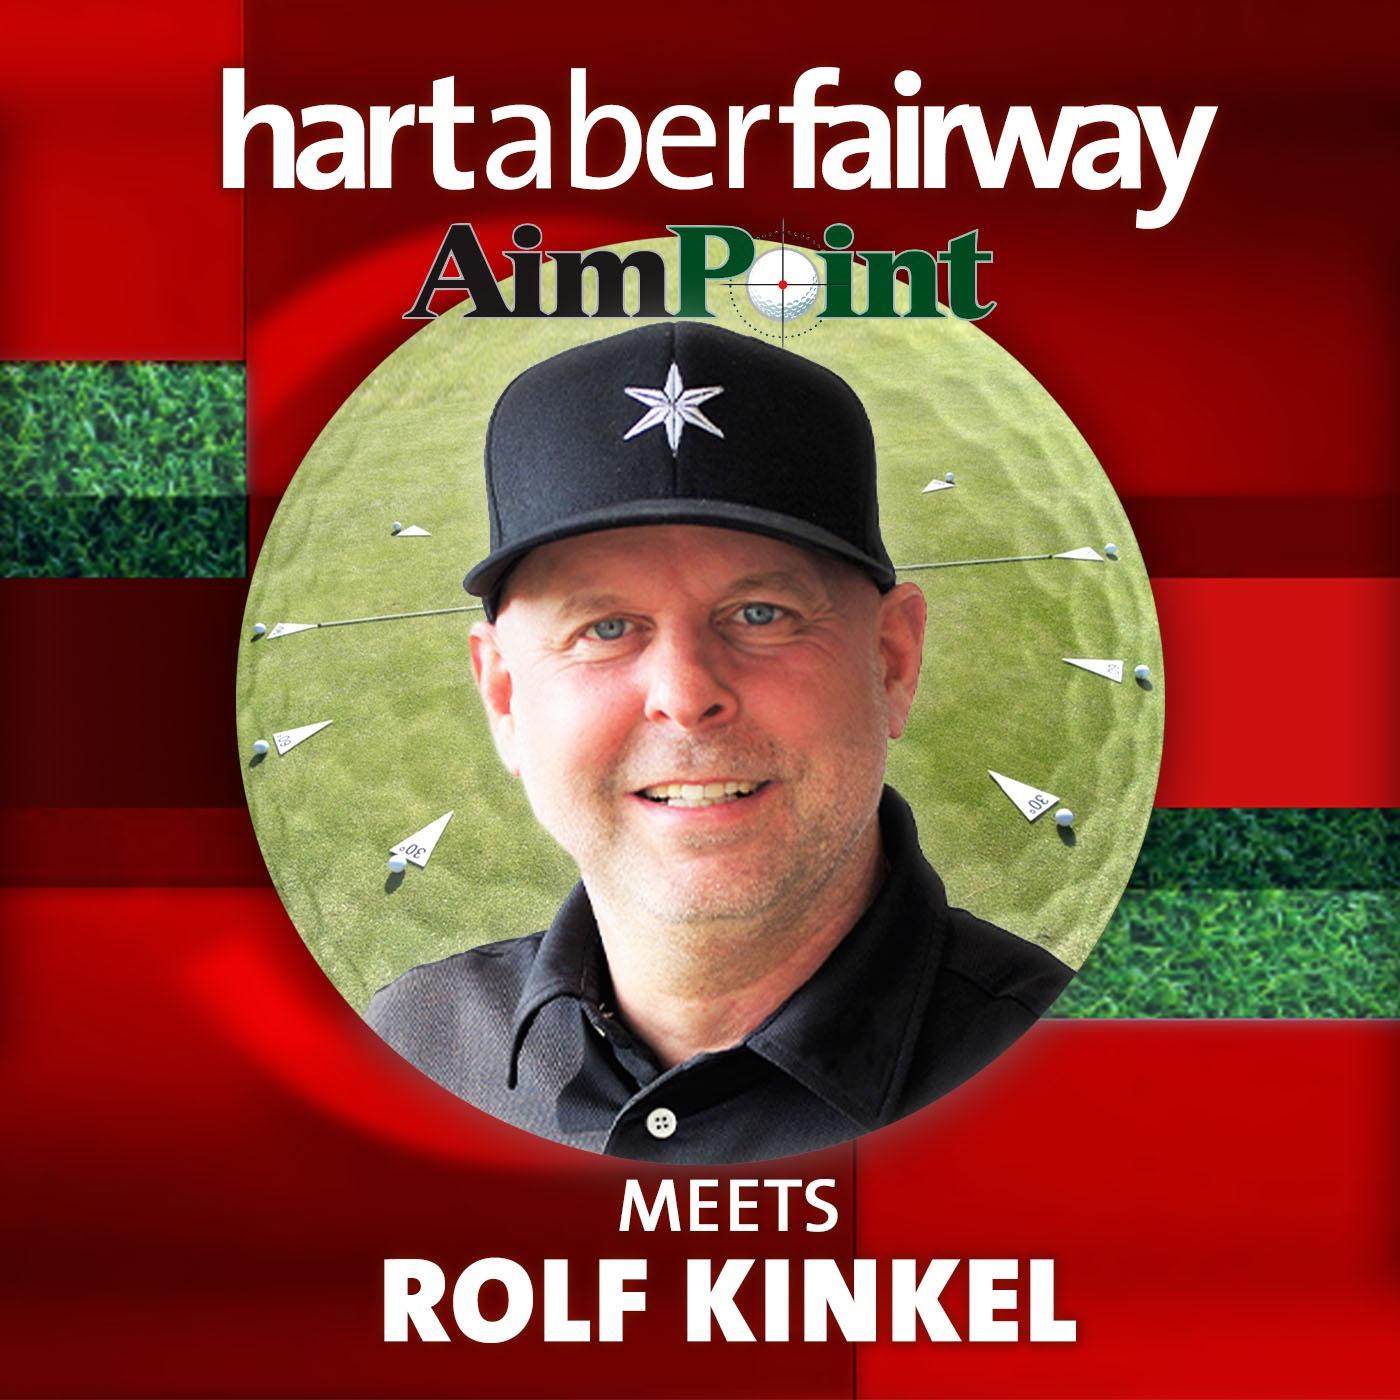 Zu Gast: Rolf Kinkel (AimPoint, PGA Pro)